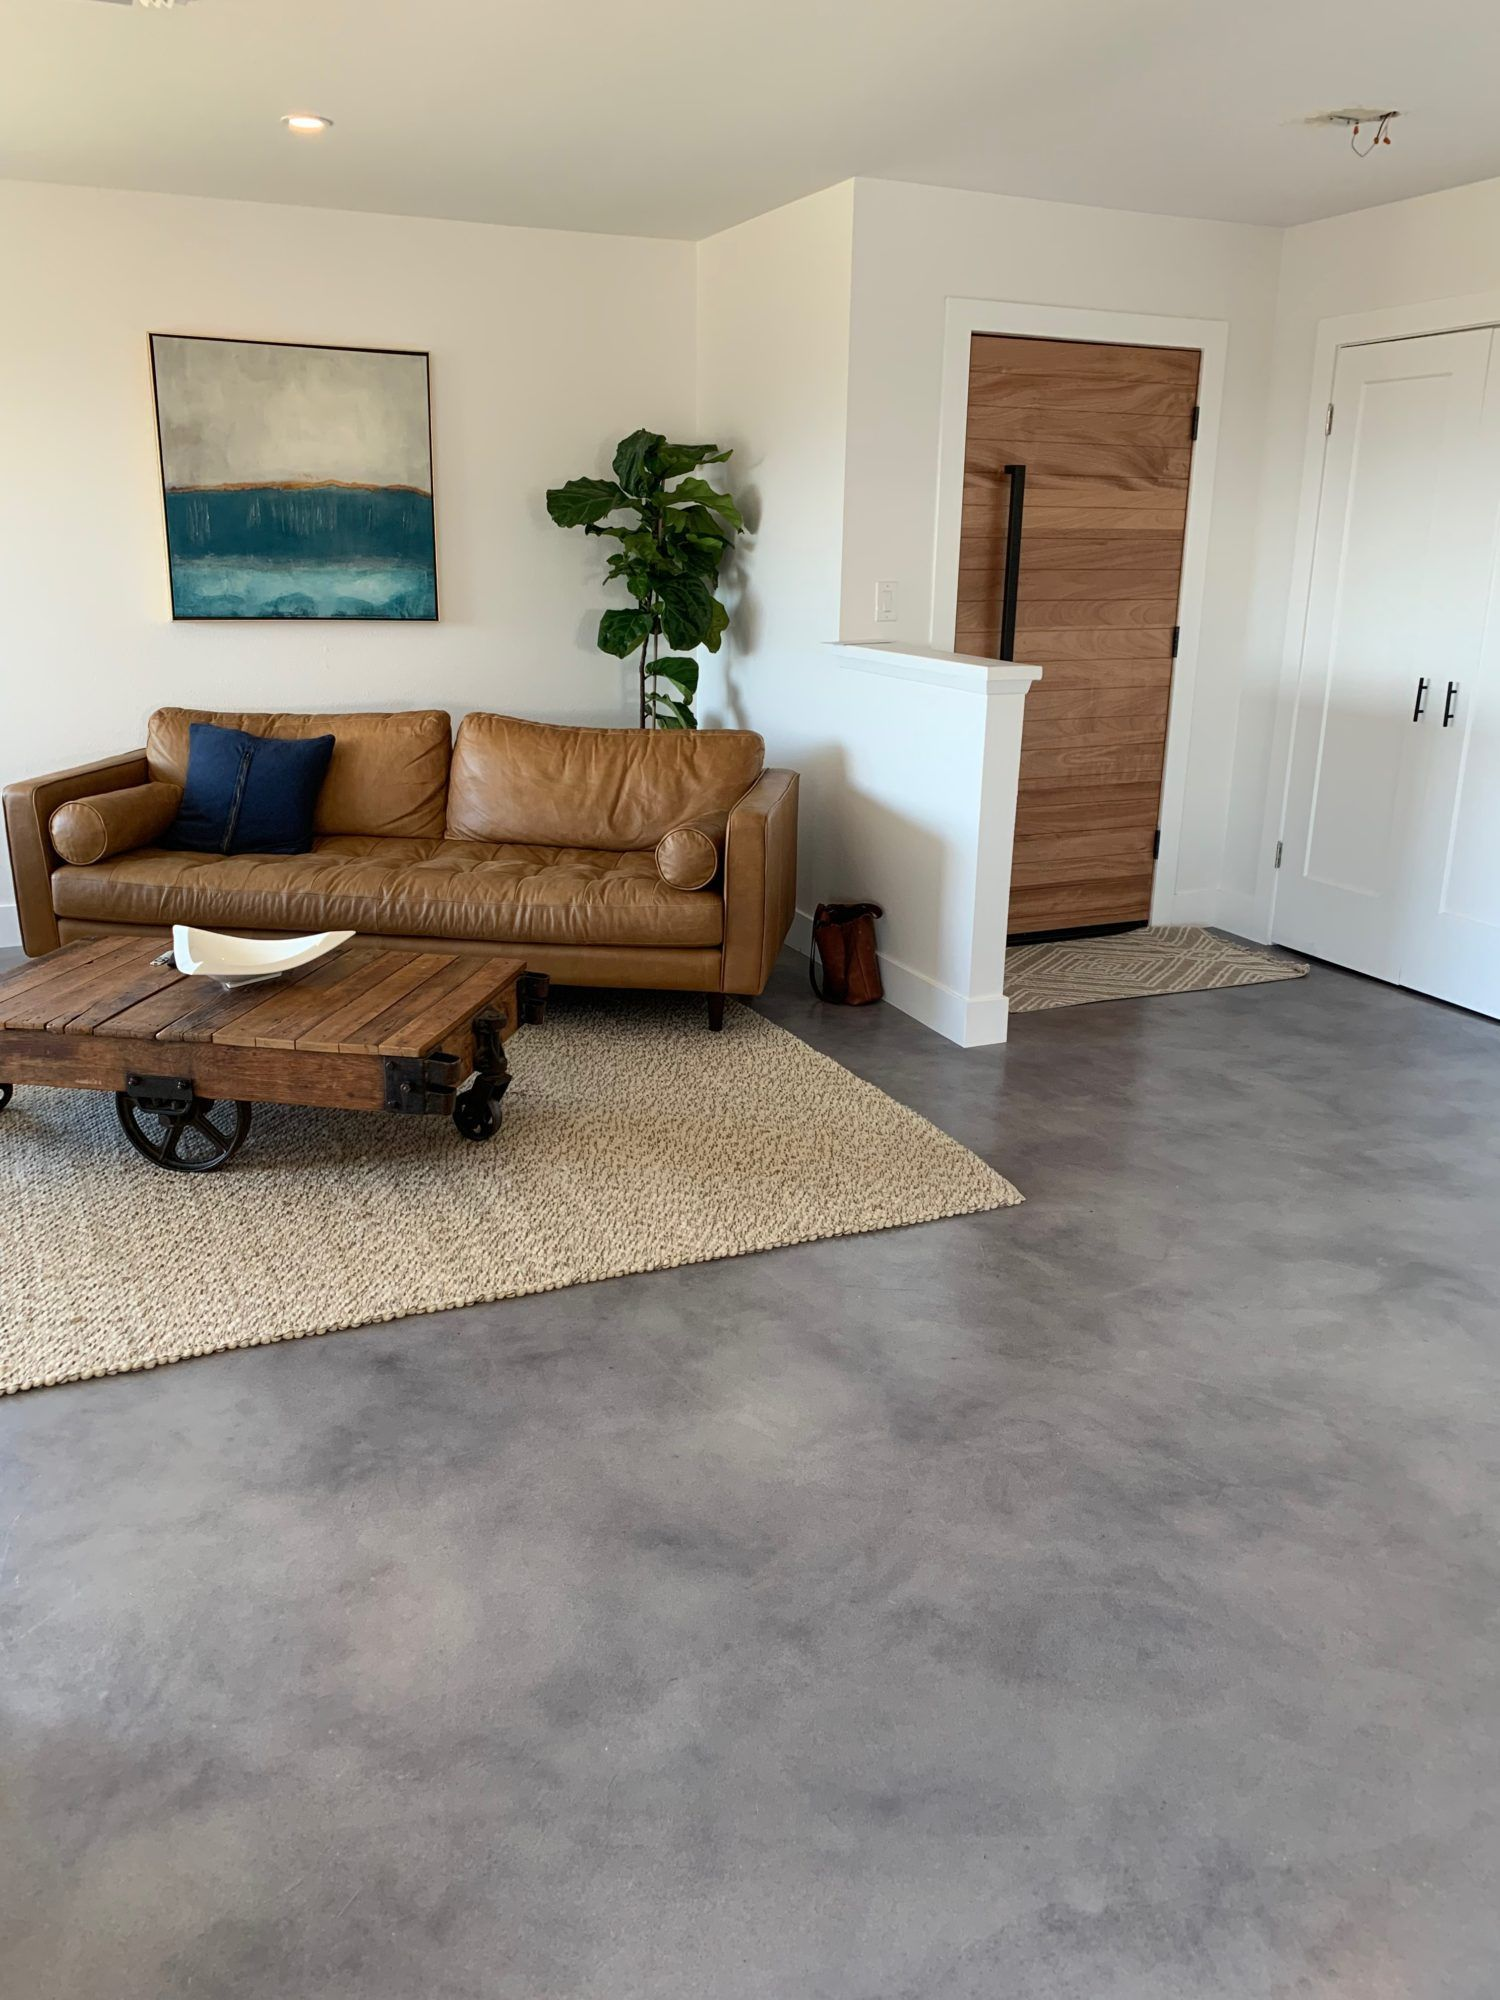 Concrete Floors In 2020 Concrete Floors Living Room Concrete Stained Floors Painted Concrete Floors